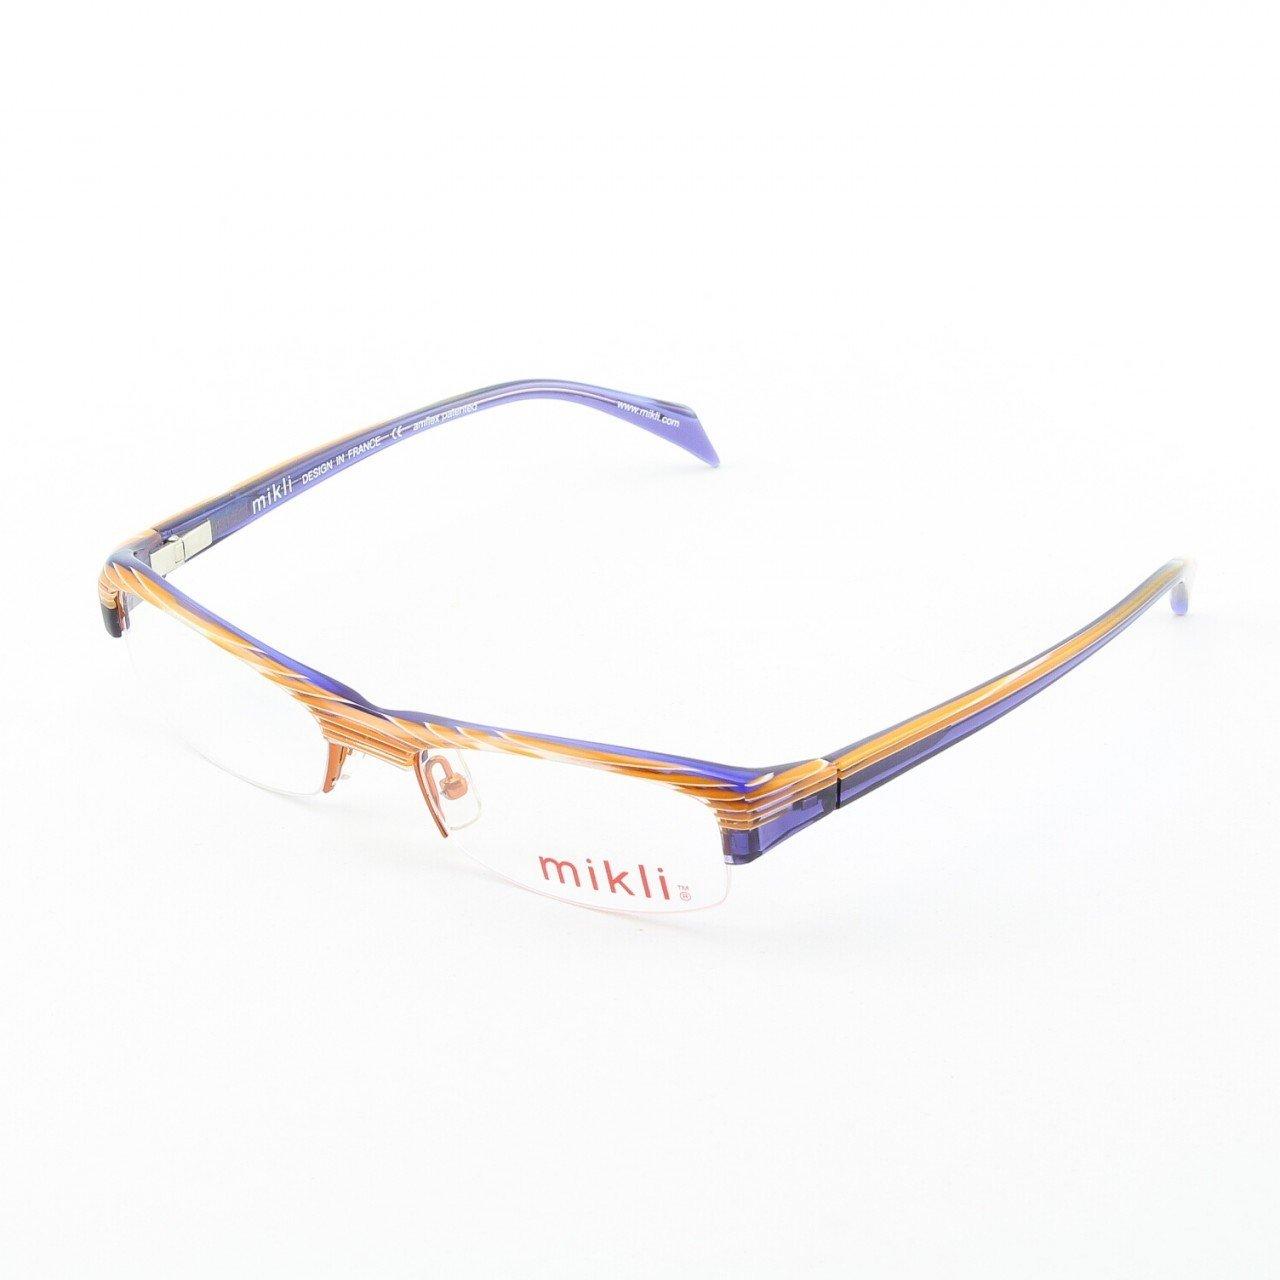 Alain Mikli Eyeglasses ML1004 Col. 121 Purple Accent with Purple Temples